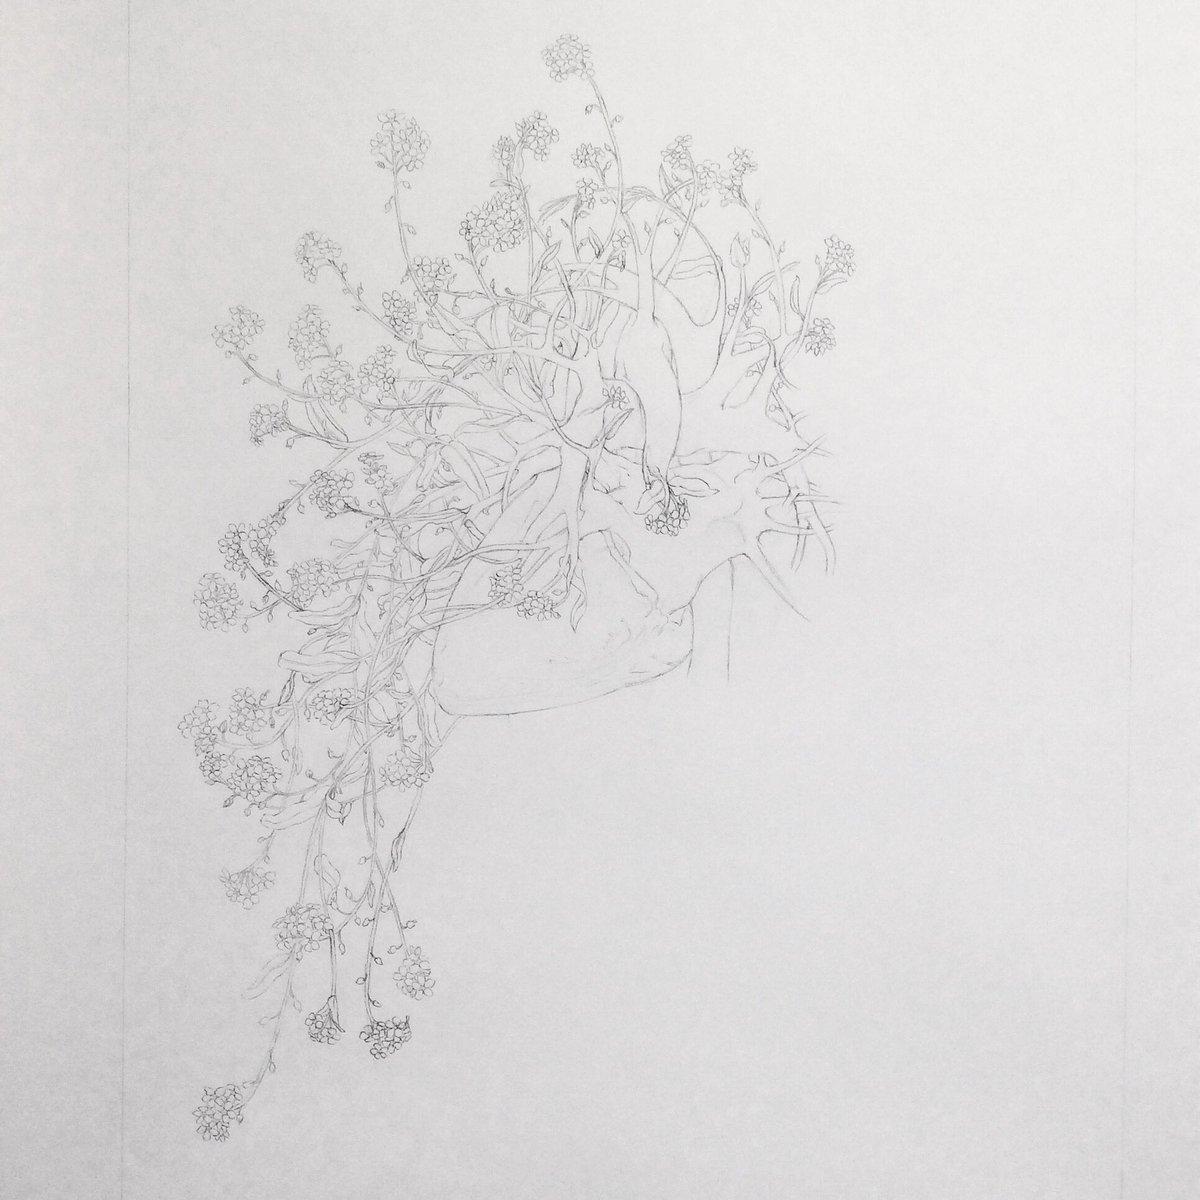 Progress of #pencil #drawing #ArcticHeart no. 12 with #forgetmenots  #art #artlife #amdrawing #illo #illustration #illustrationart #fineart #finearts #artoftheday #workinprogress #humanheart #wippic.twitter.com/GNQ6bvfxb5